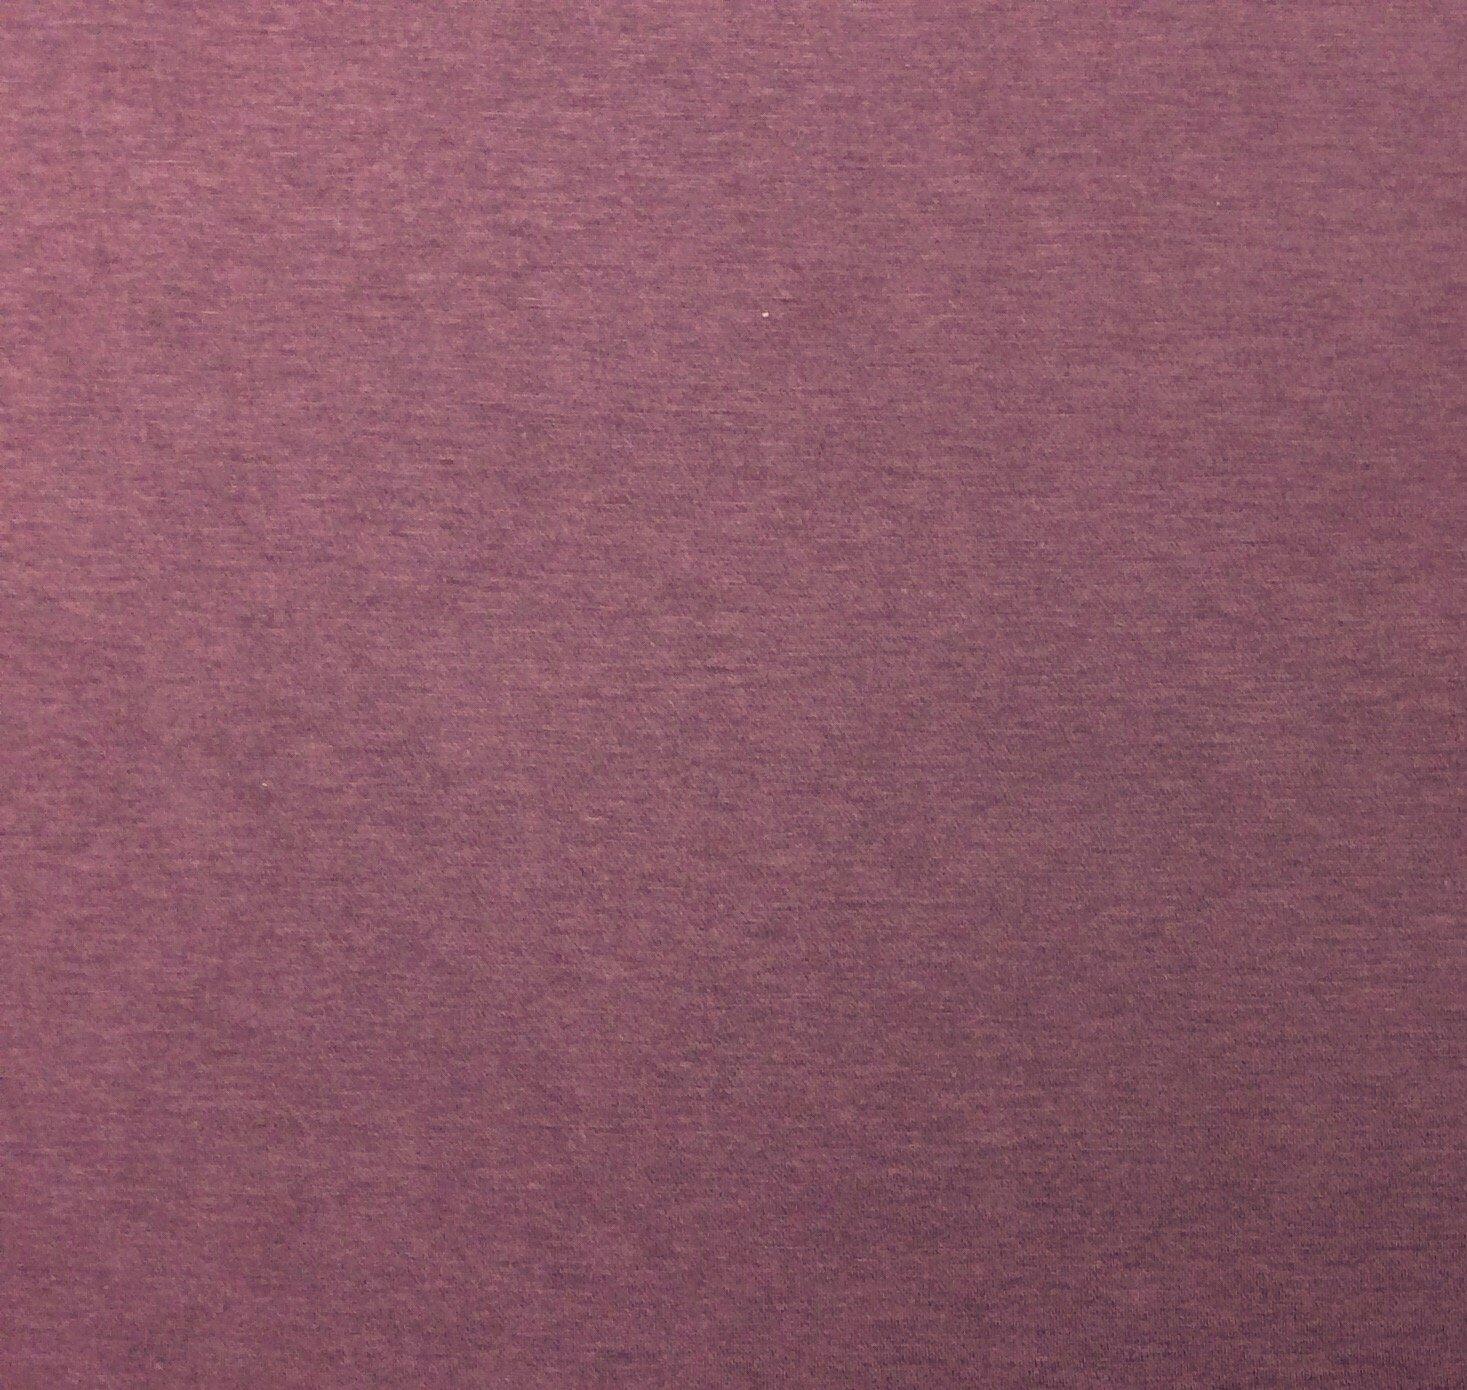 Aubergine  Knit Apparel Fabric RMRB4699